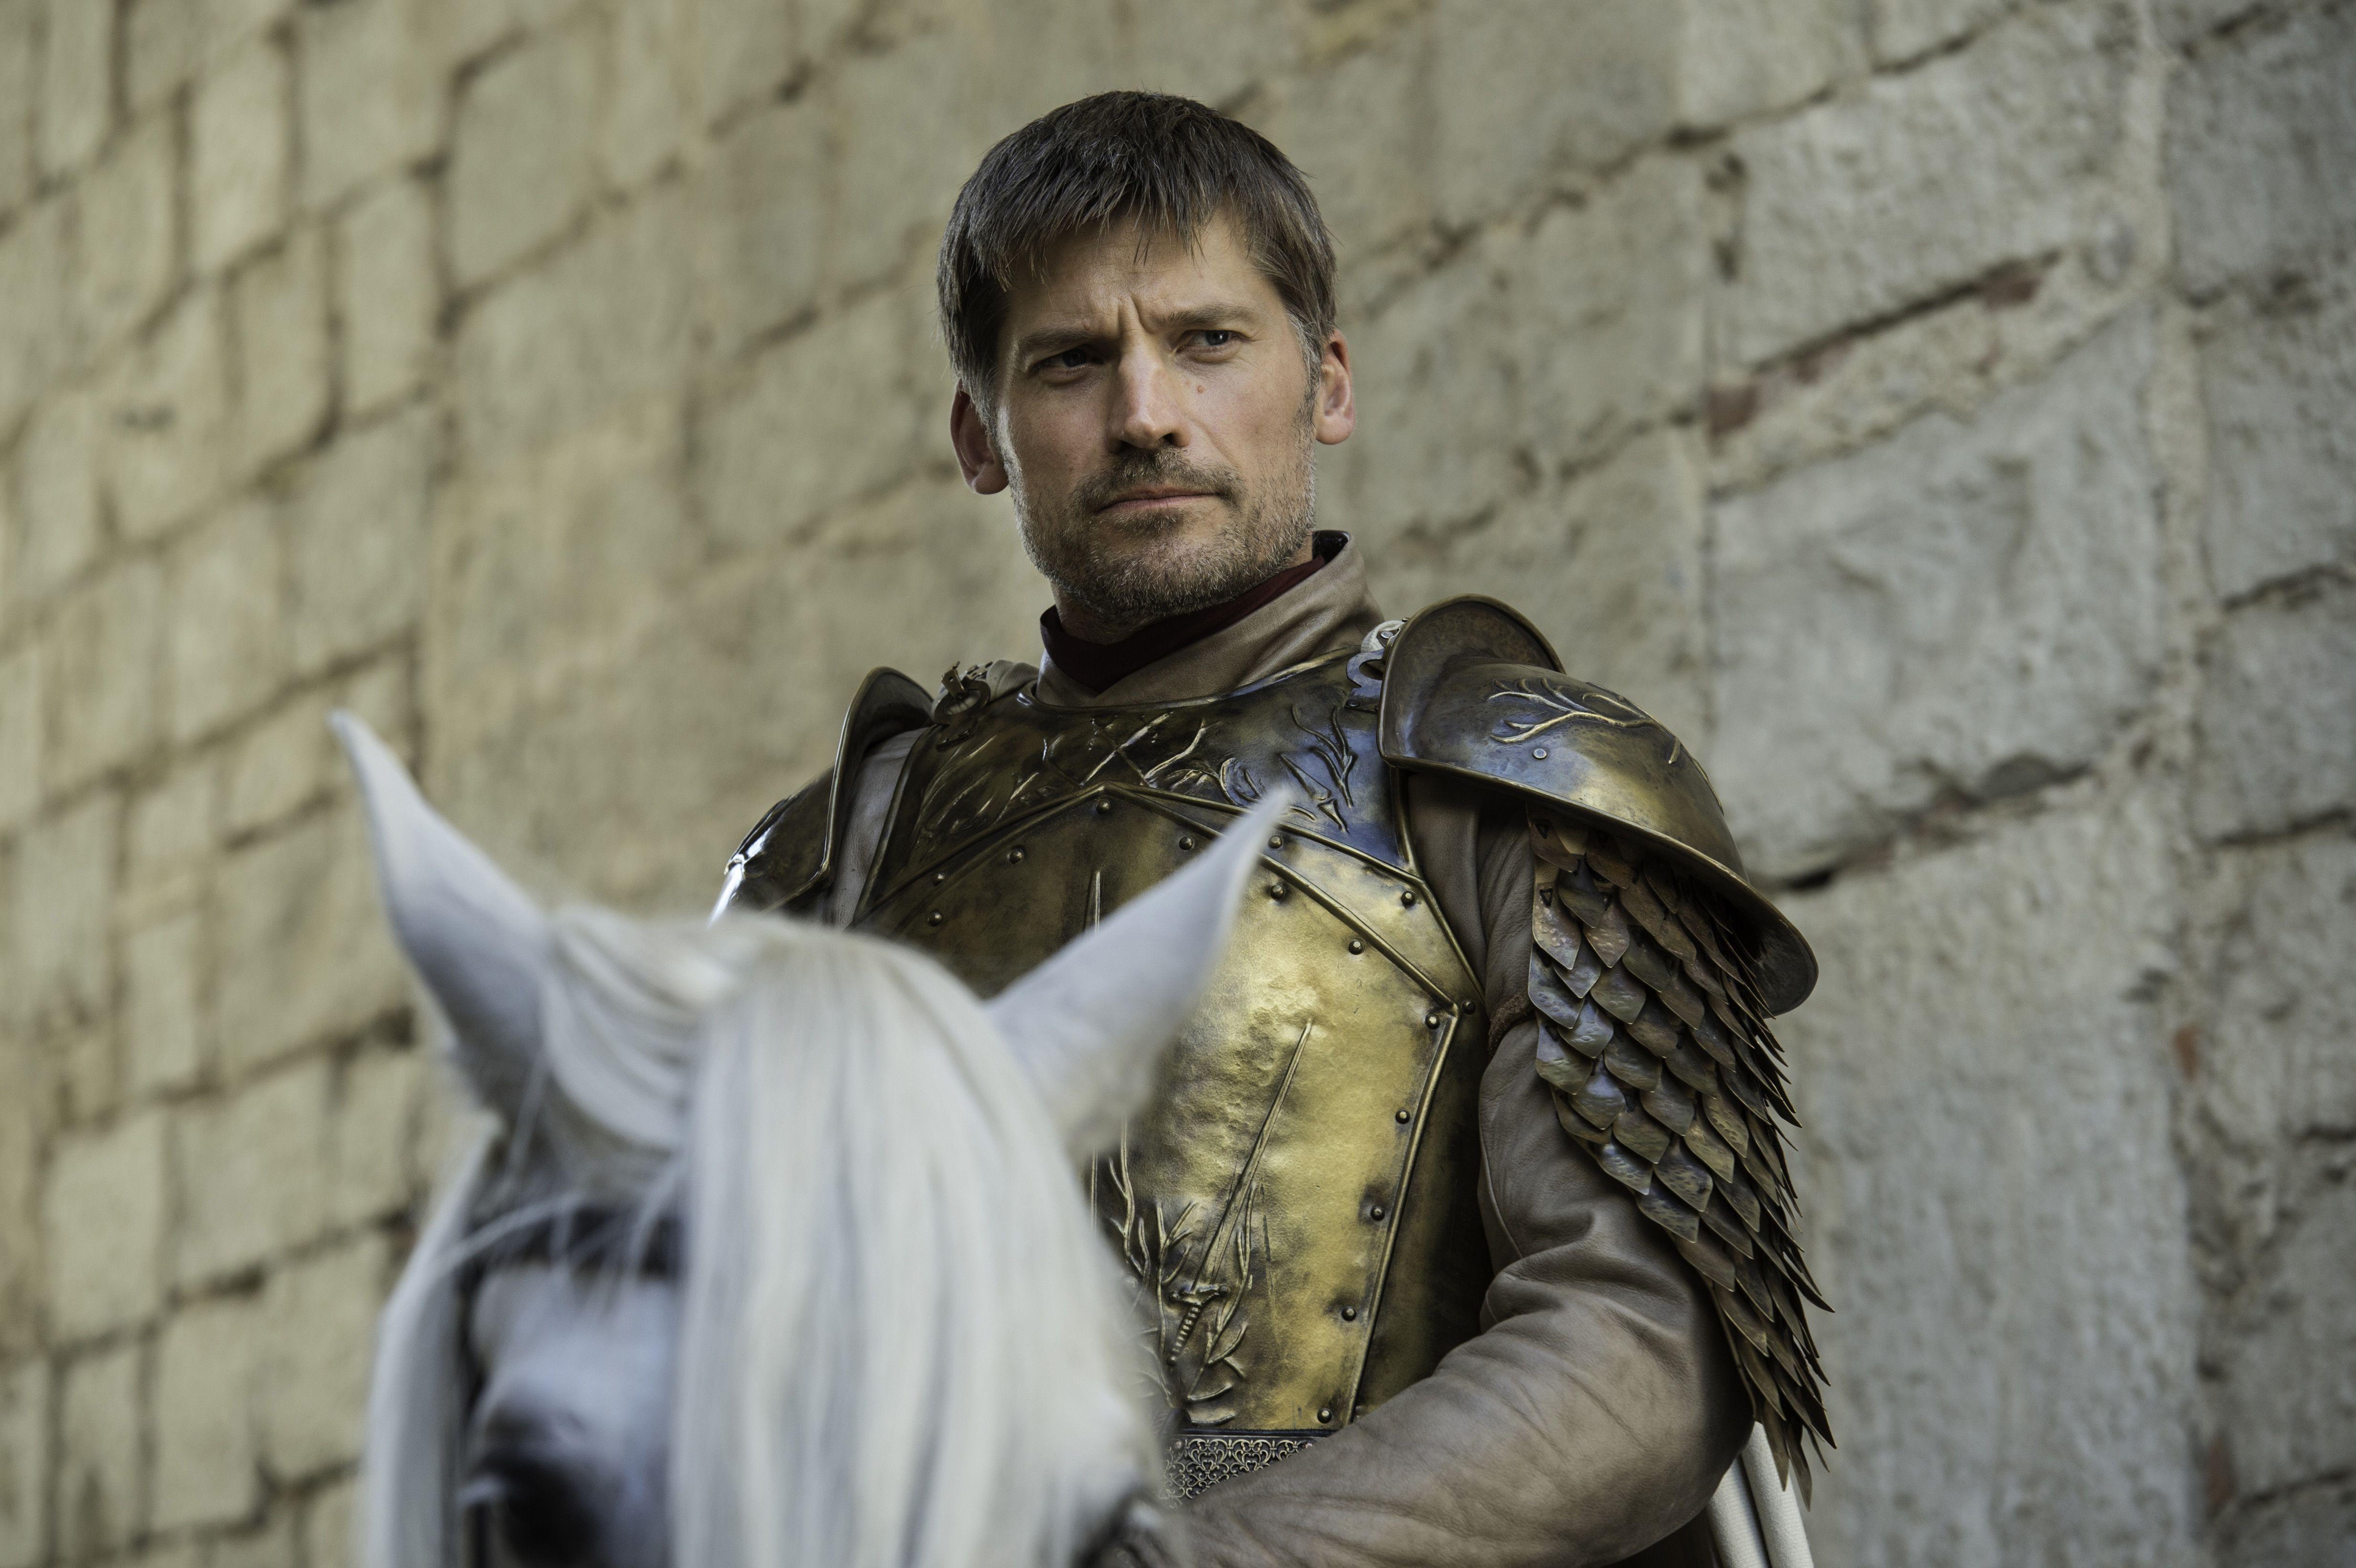 Jon Snow and Daenerys Targaryen Relationship Timeline Best Game of